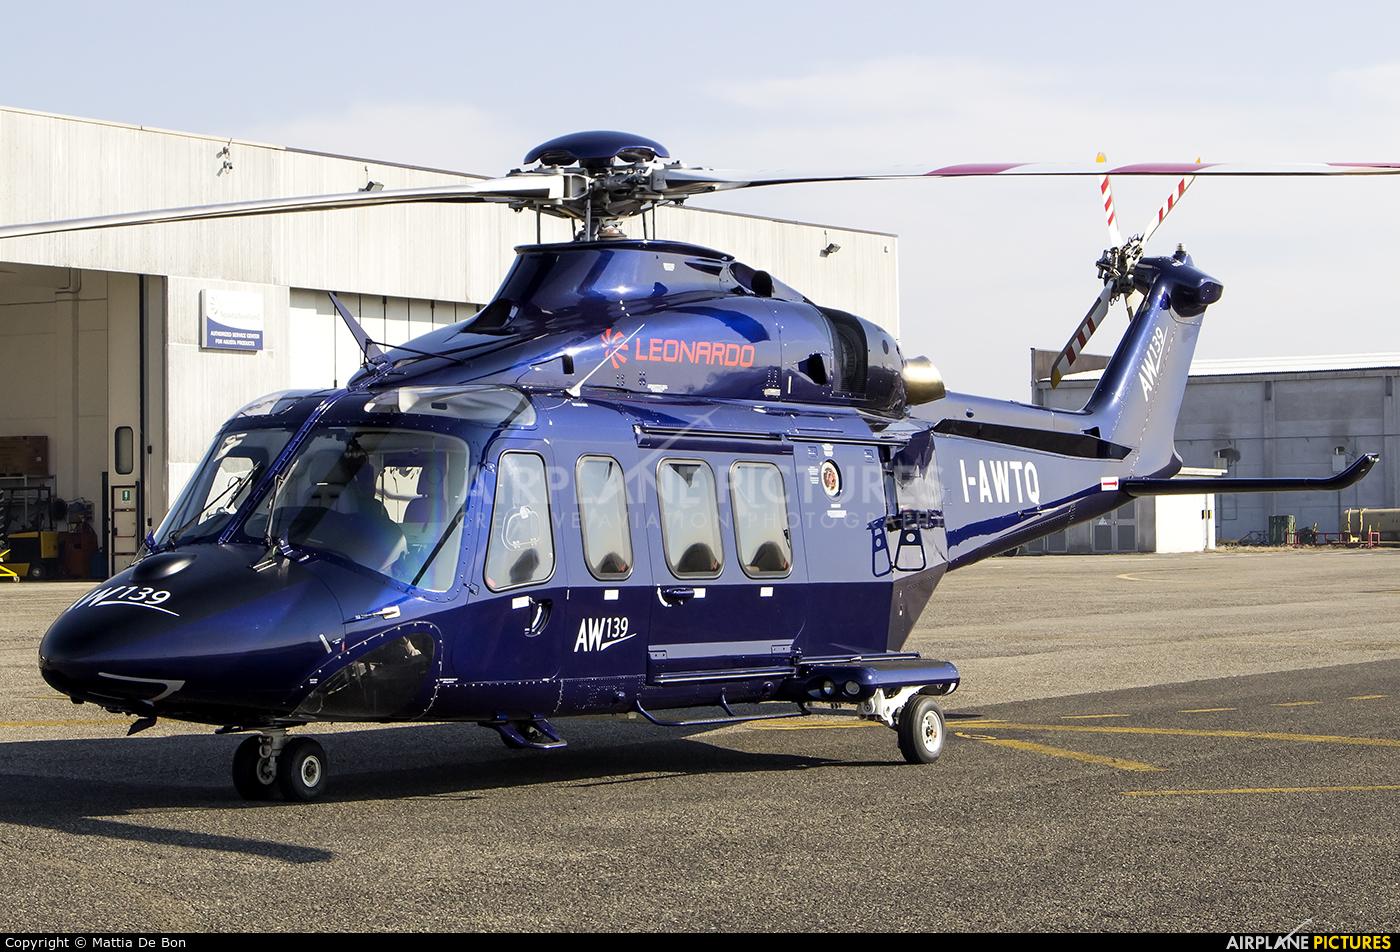 Leonardo I-AWTQ aircraft at Reggio Emilia